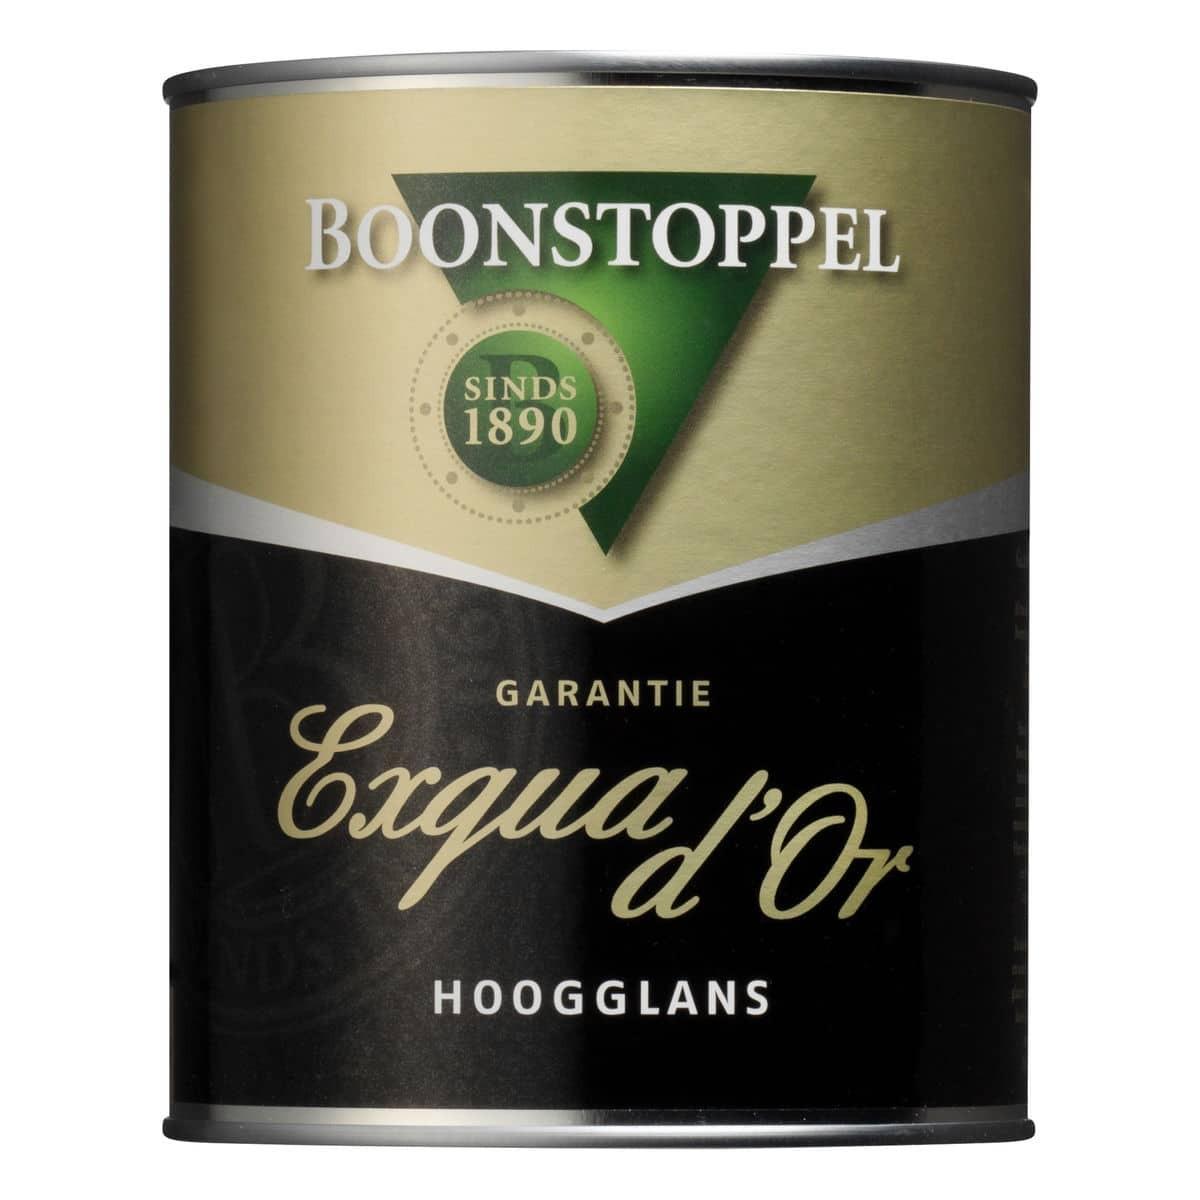 Boonstoppel Garantie Exqua d'Or Hoogglans